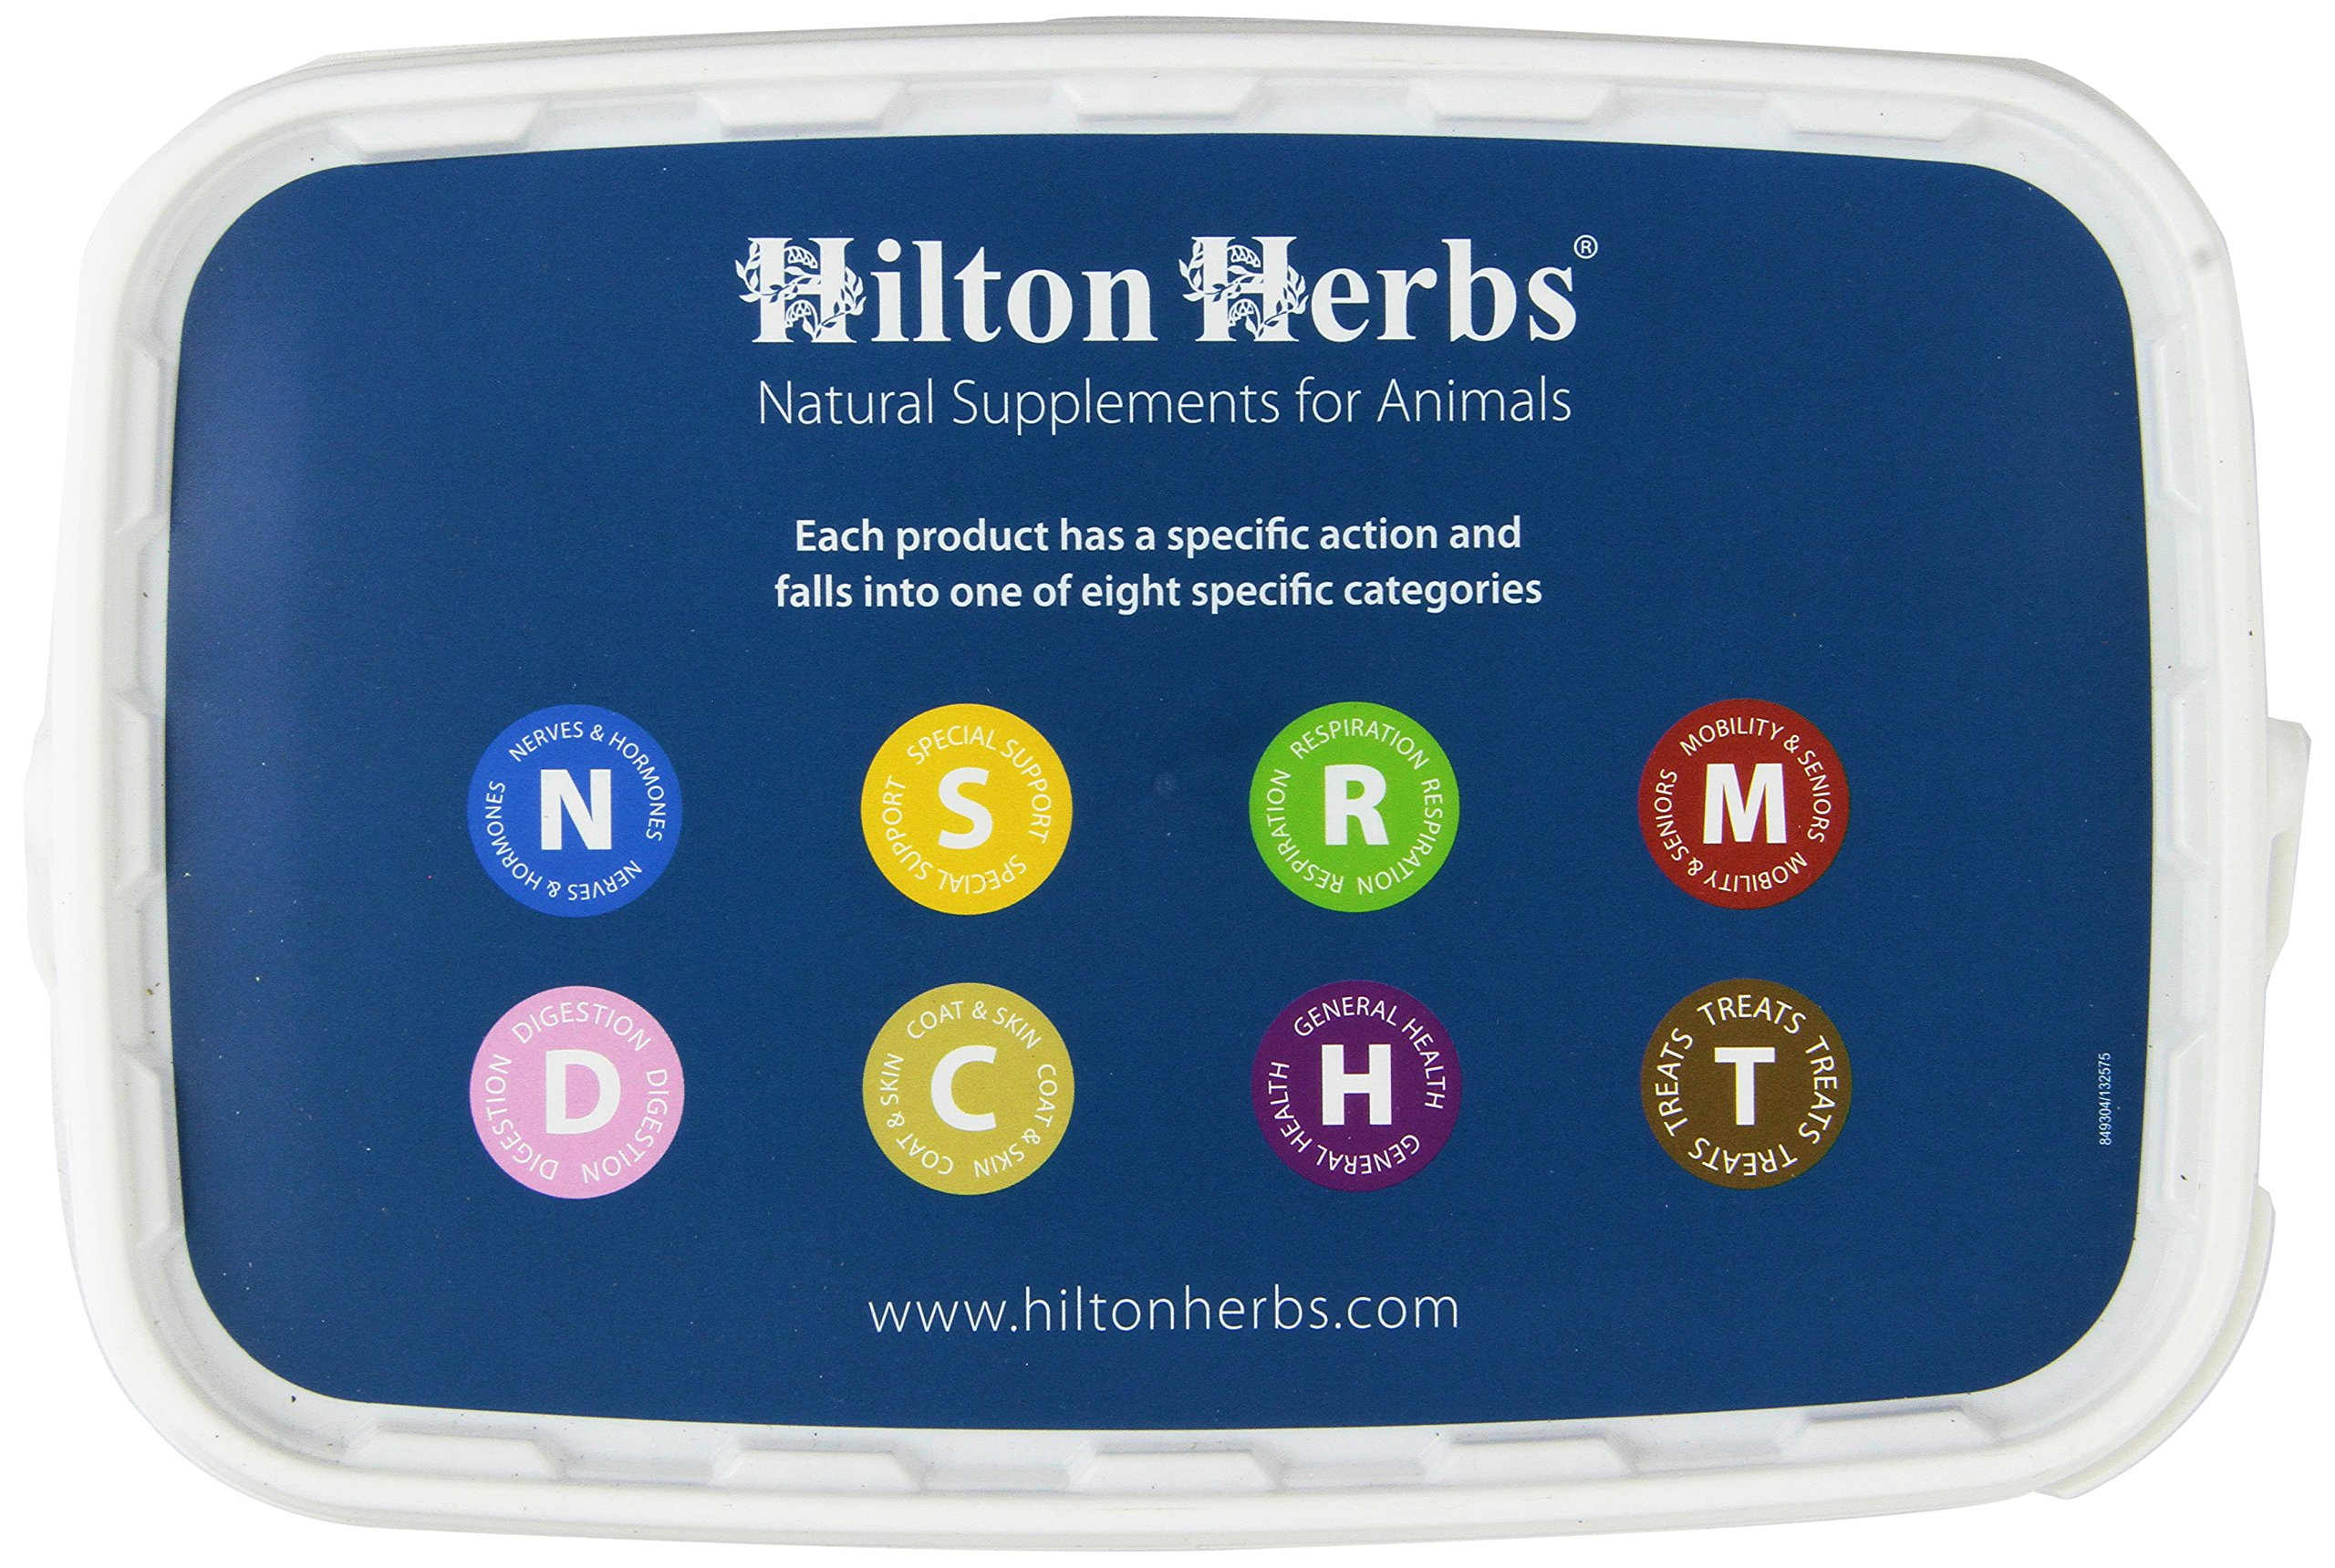 Hilton Herbs Milk Thistle Plus Detox Supplement for Horses, 1kg Tub